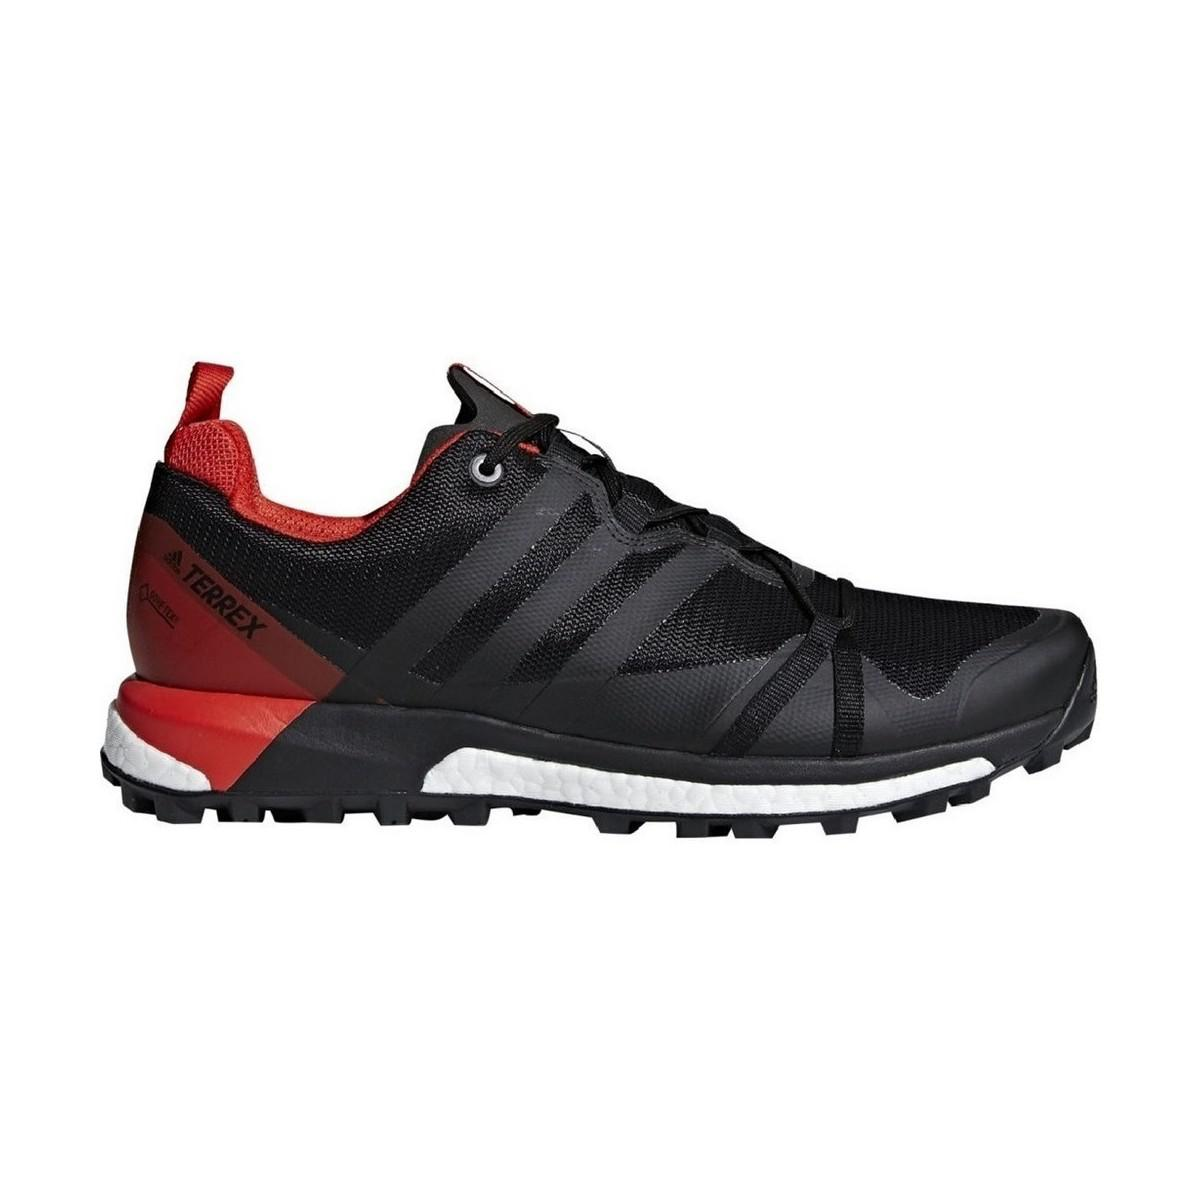 adidas shoes goretex men